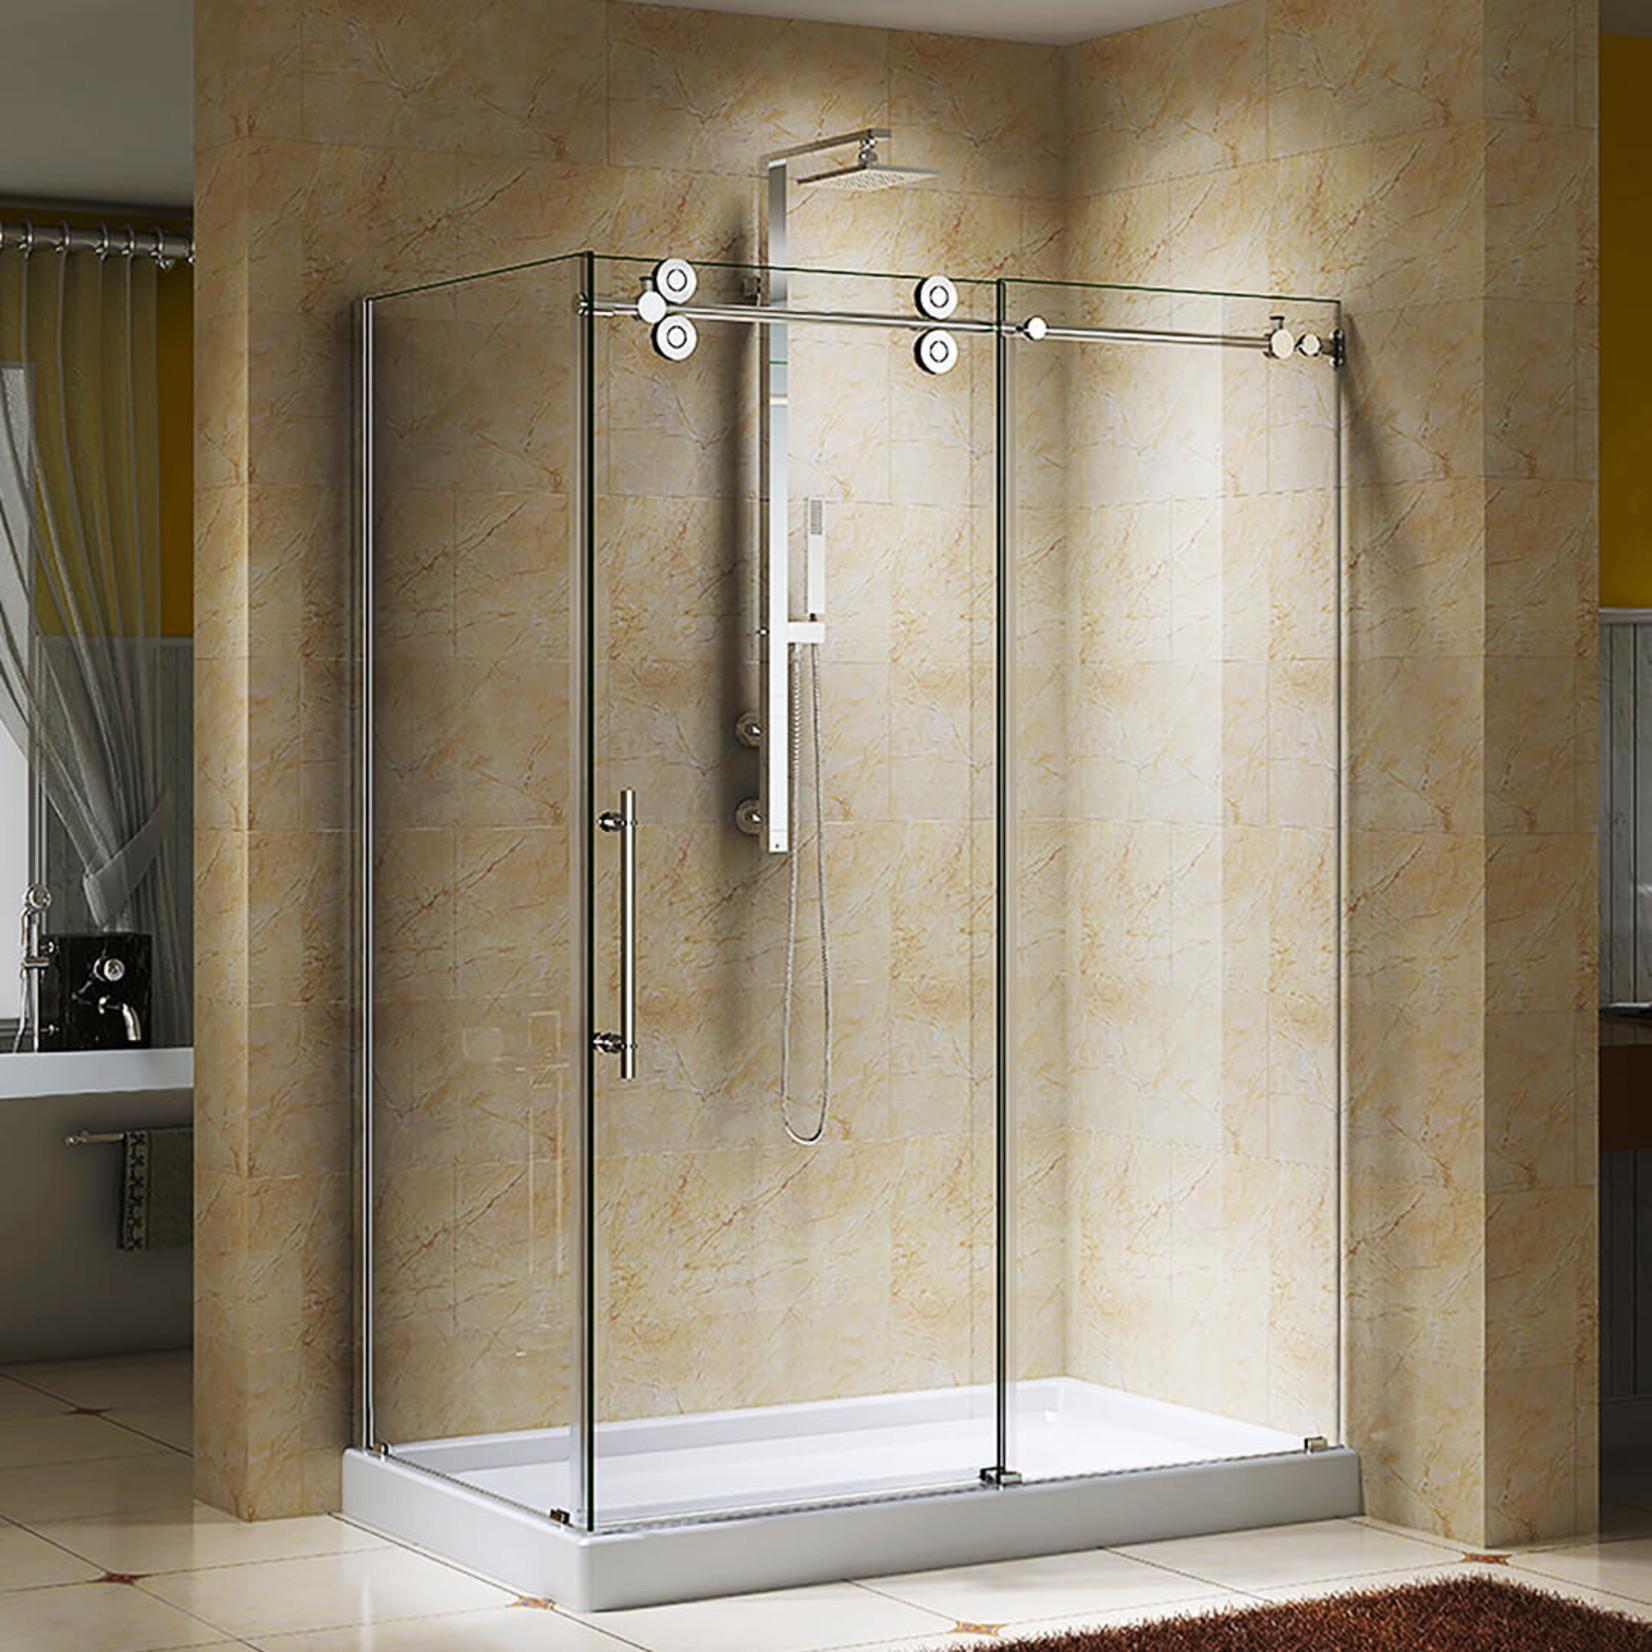 Reversible shower set 10mm chrome Zirkon Jade series